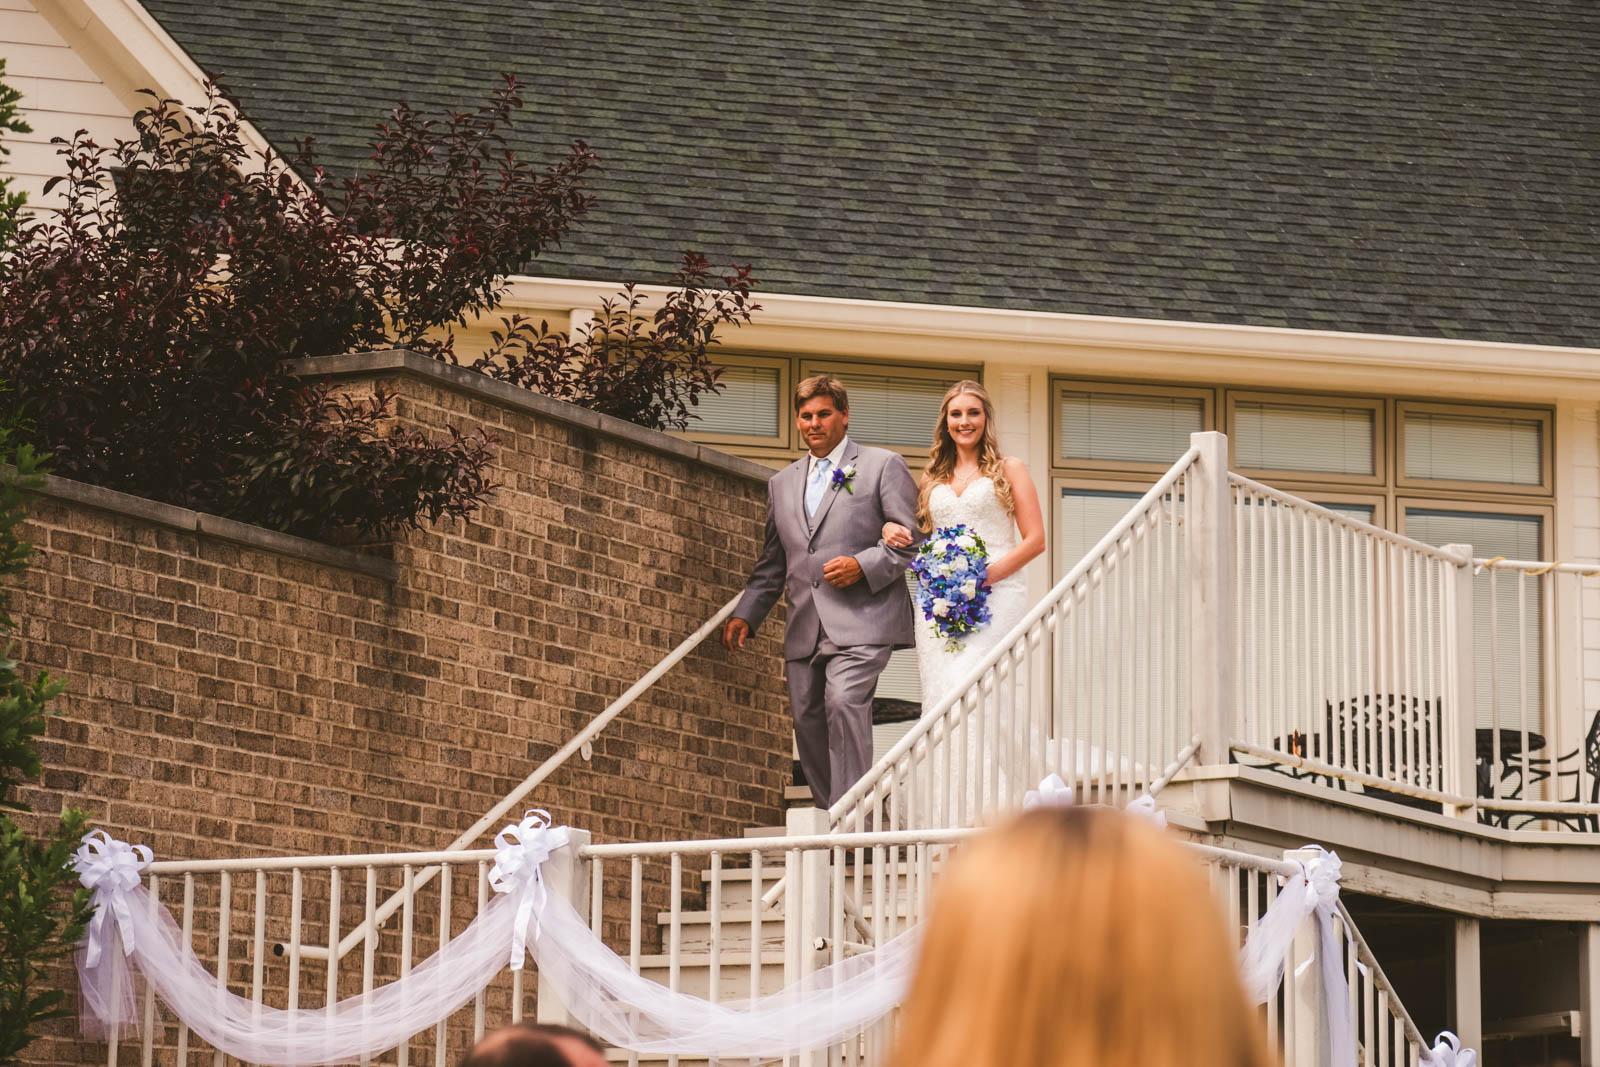 Father of Bride Walks Down Aisle on Wedding Day at Stone Ridge Golf Club